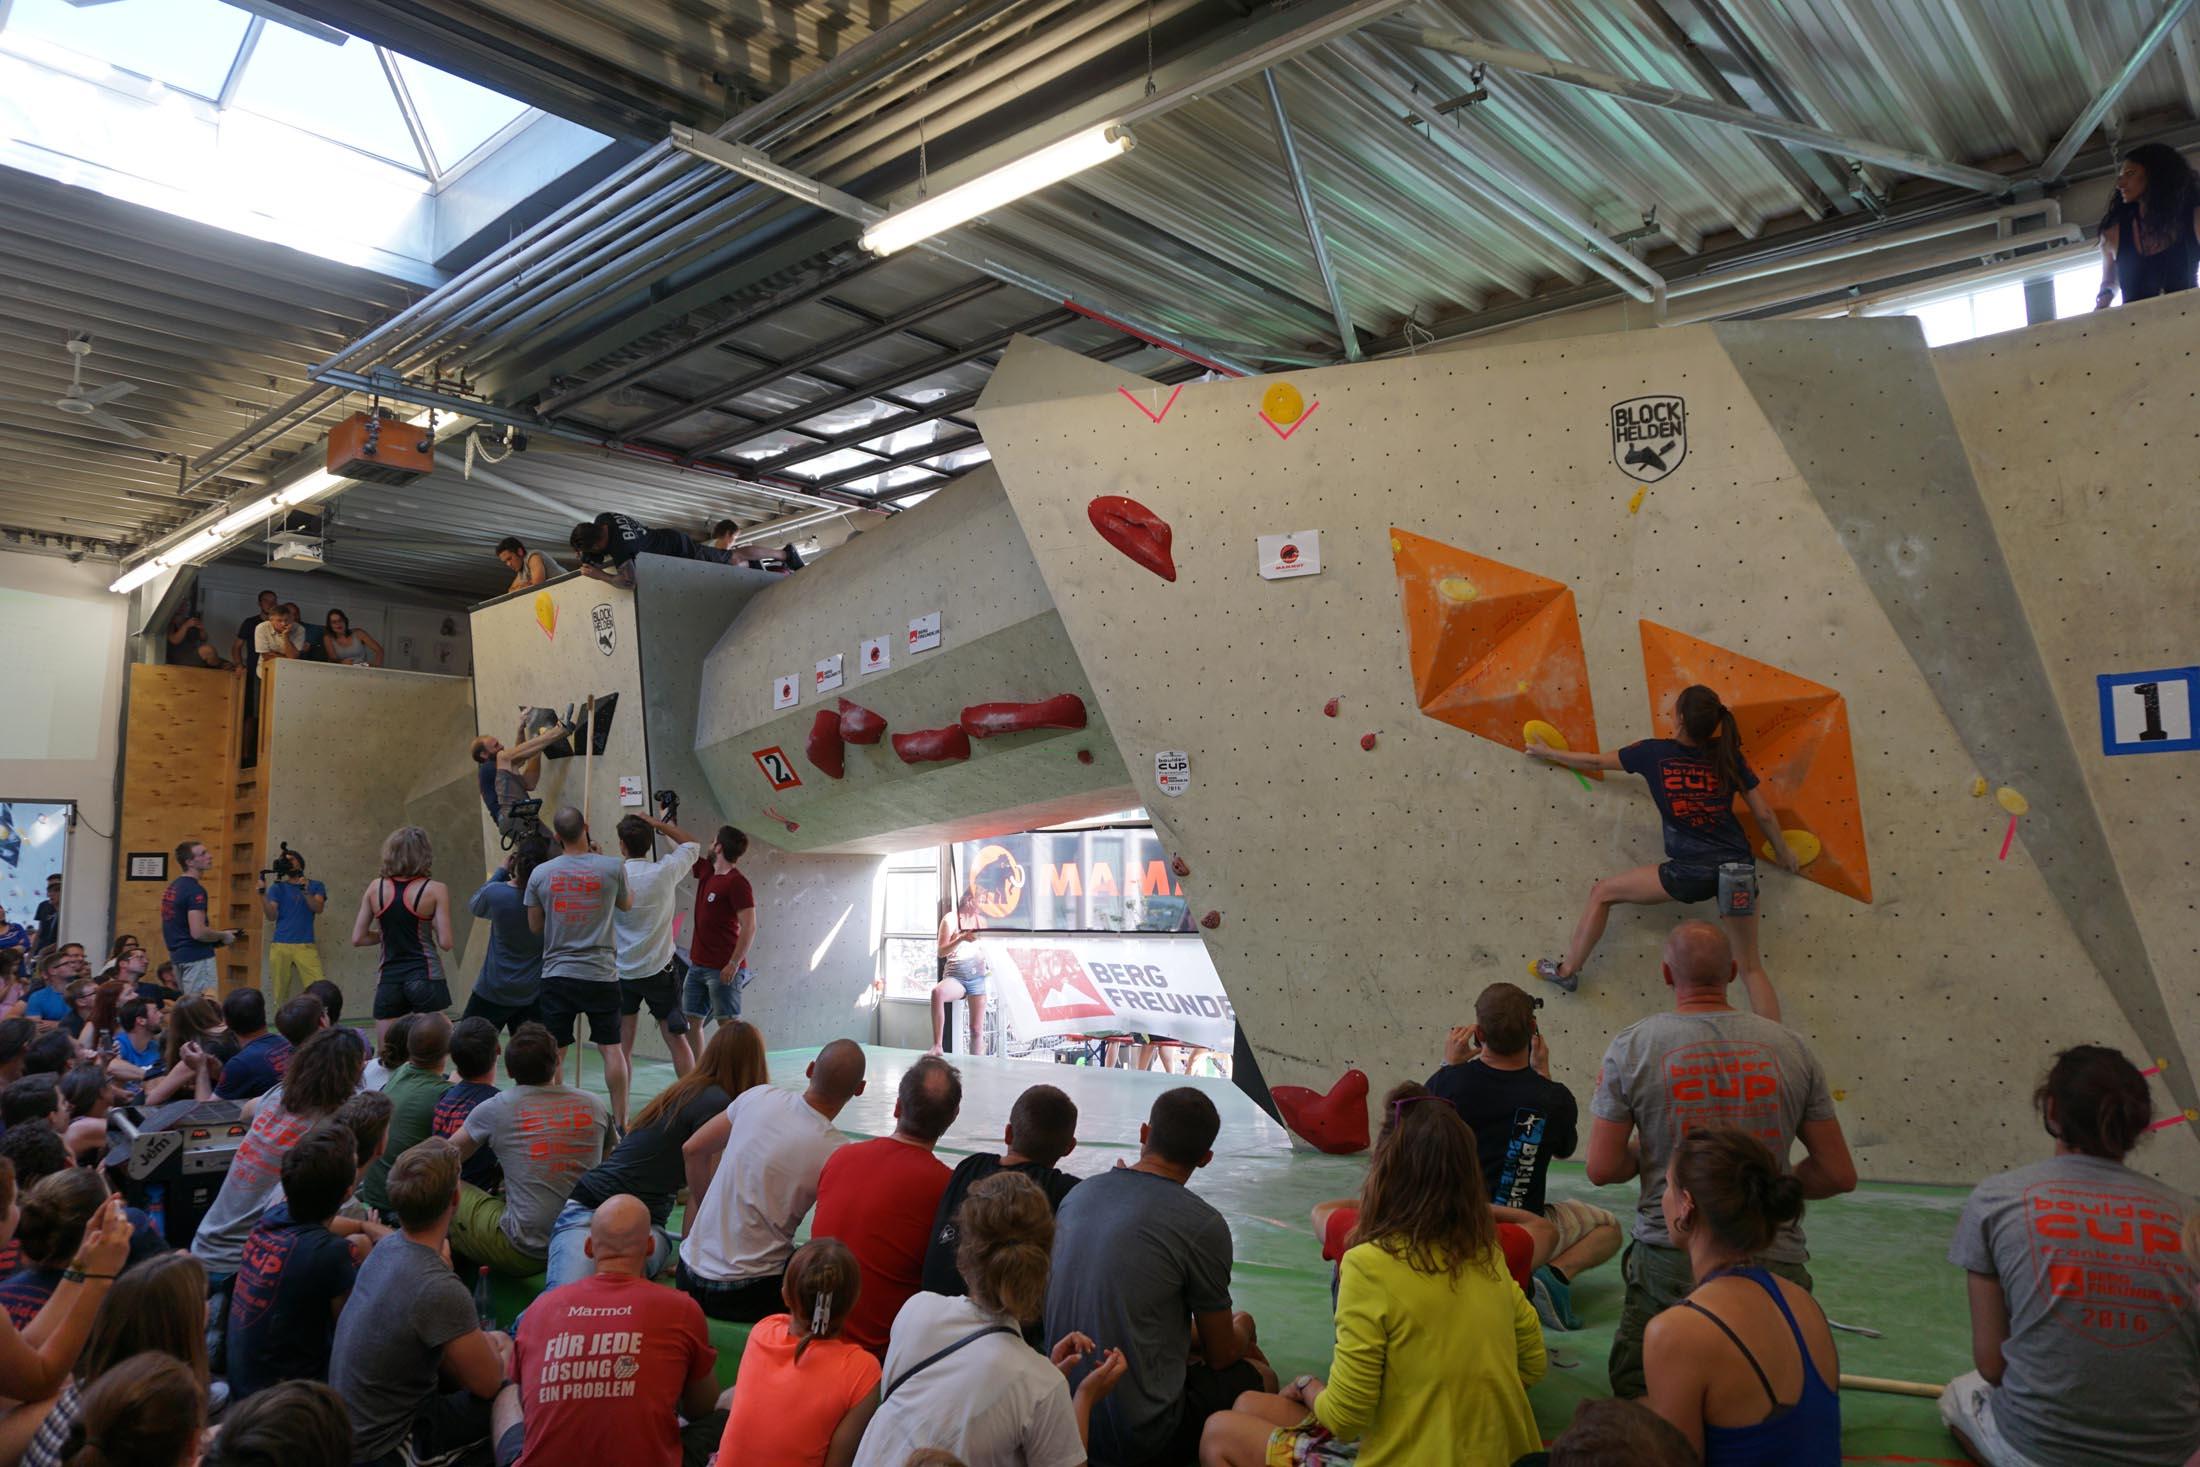 Finale, internationaler bouldercup Frankenjura 2016, BLOCKHELDEN Erlangen, Mammut, Bergfreunde.de, Boulderwettkampf07092016513